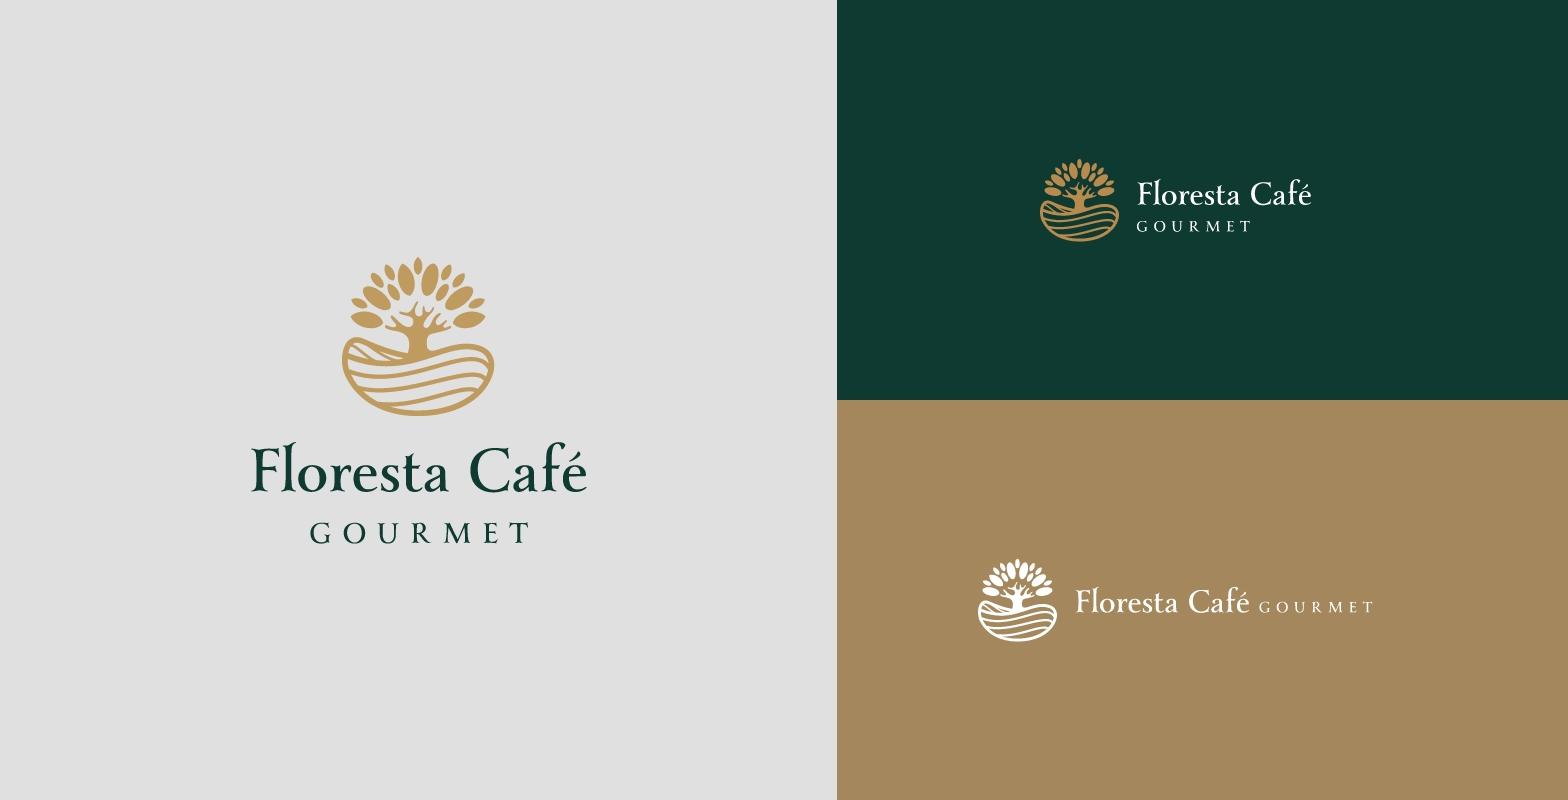 Floresta Café 1